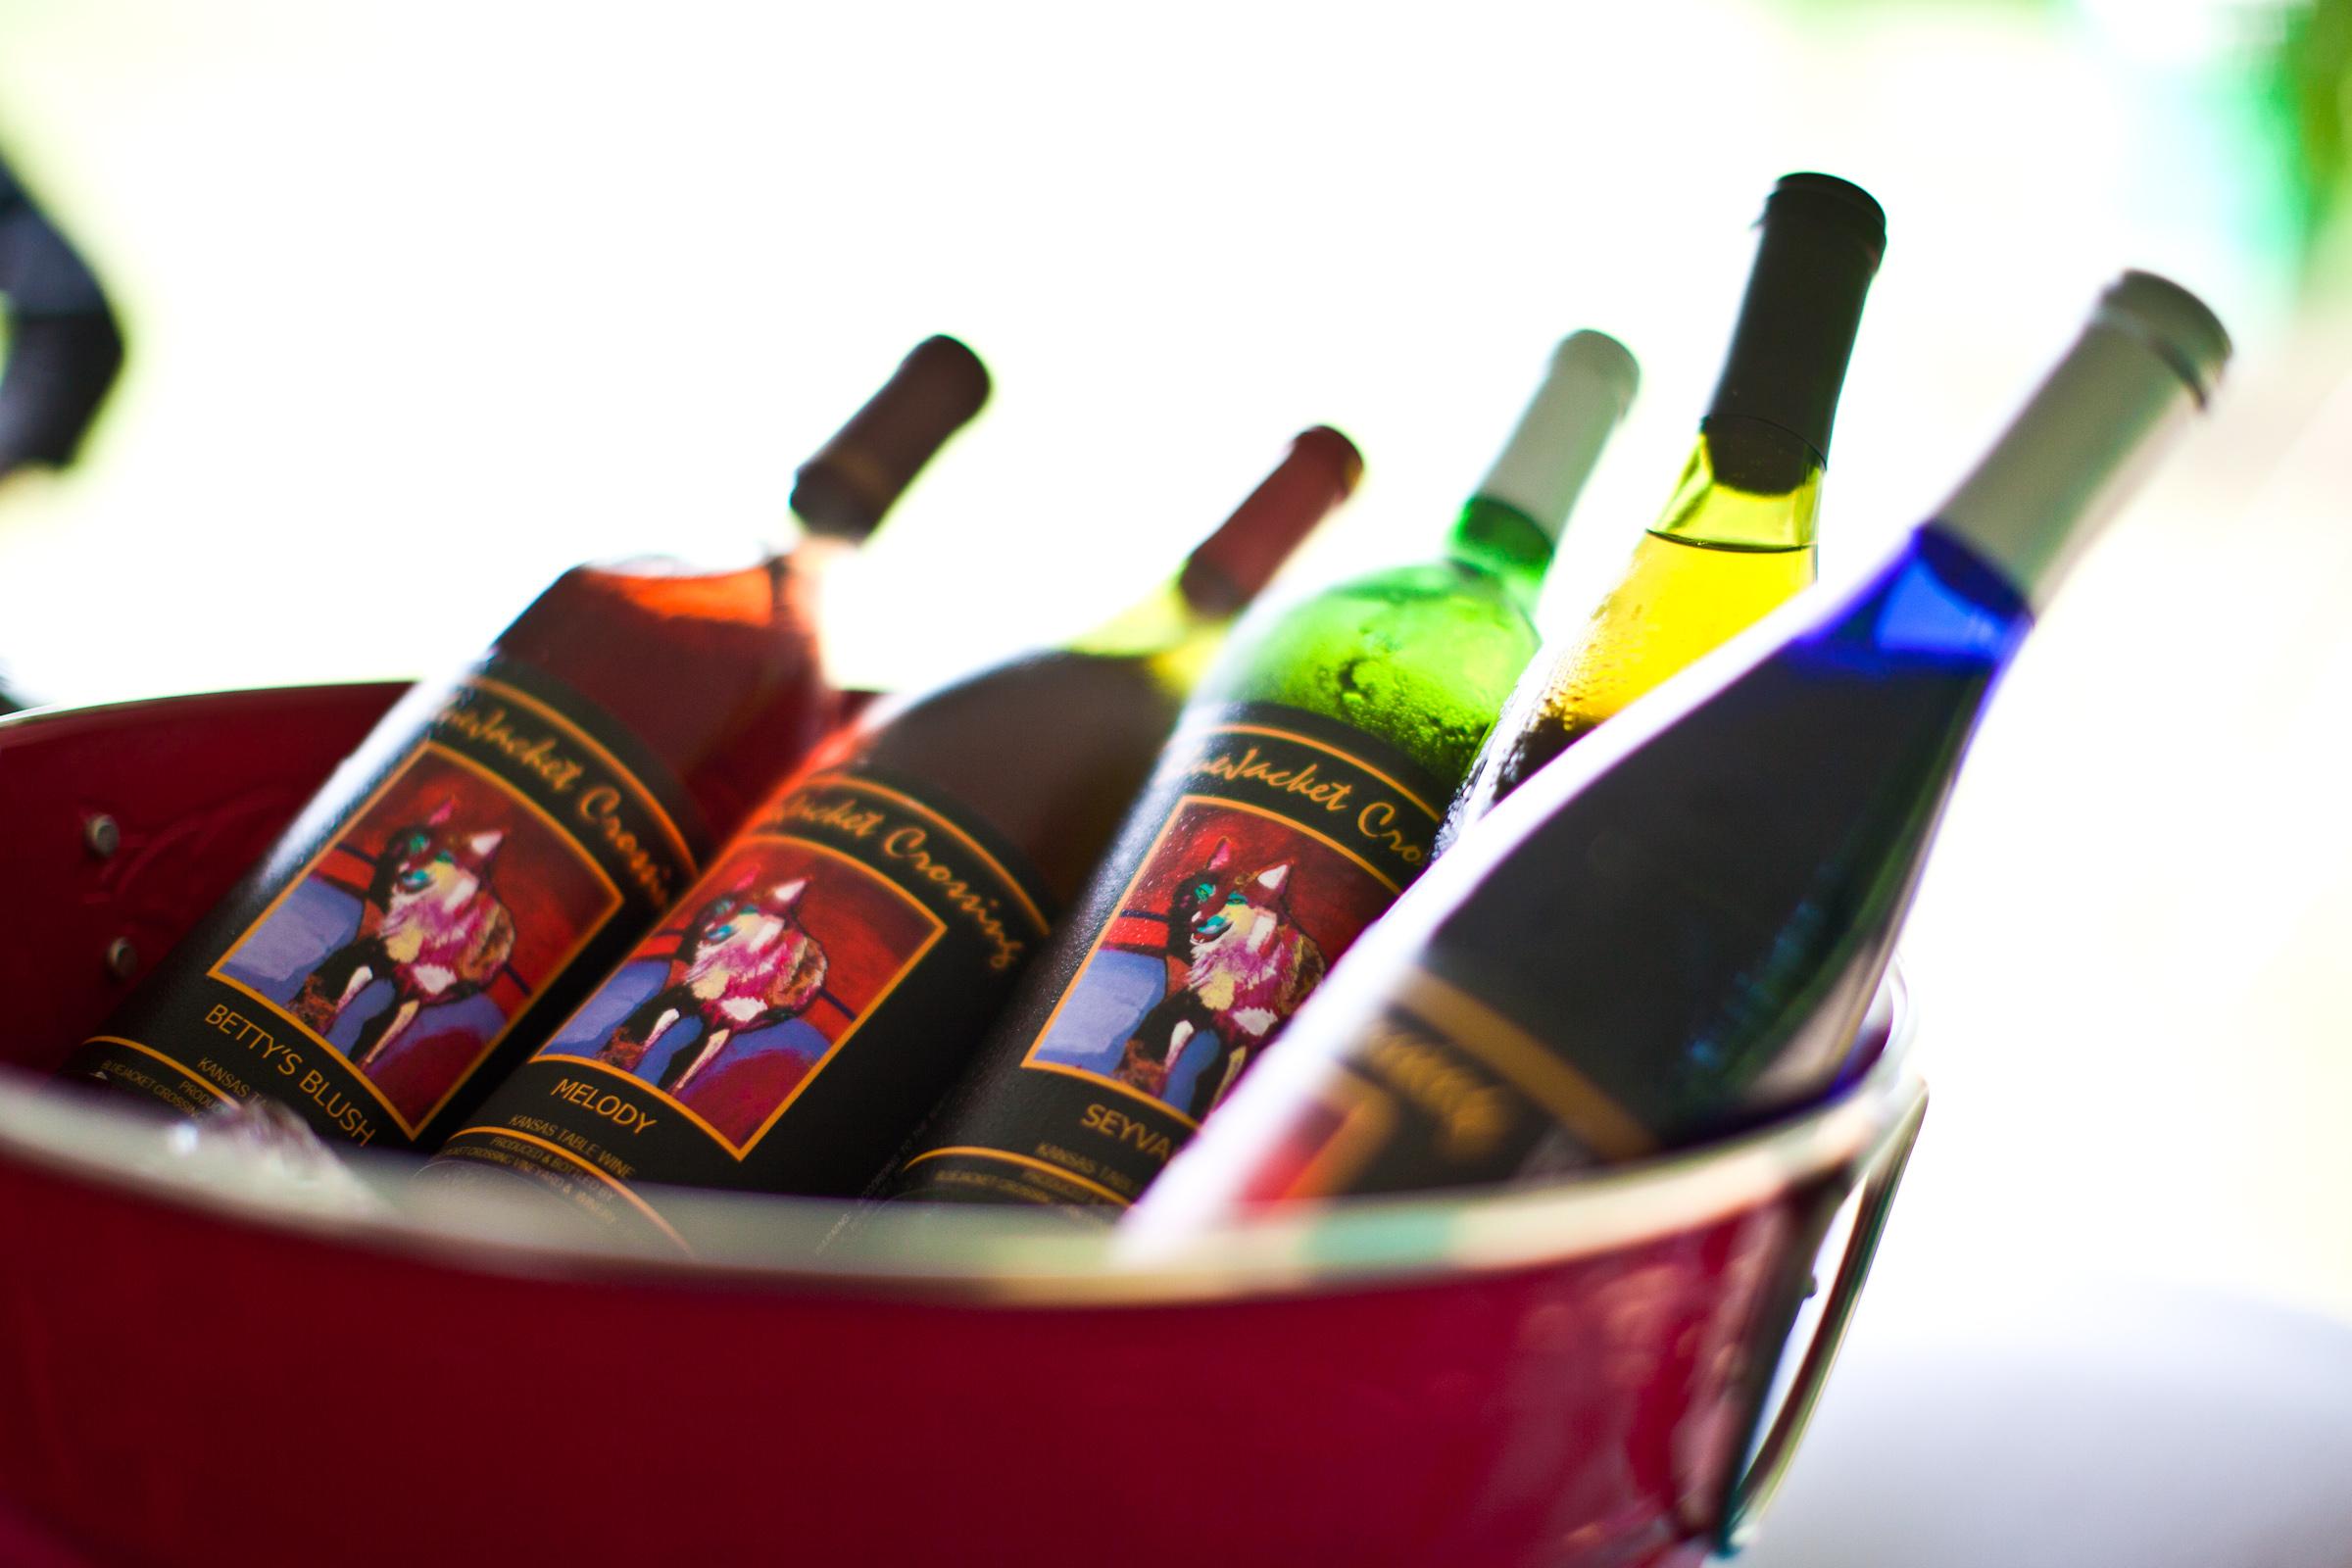 Bottles / Bluejacket Crossing Wine